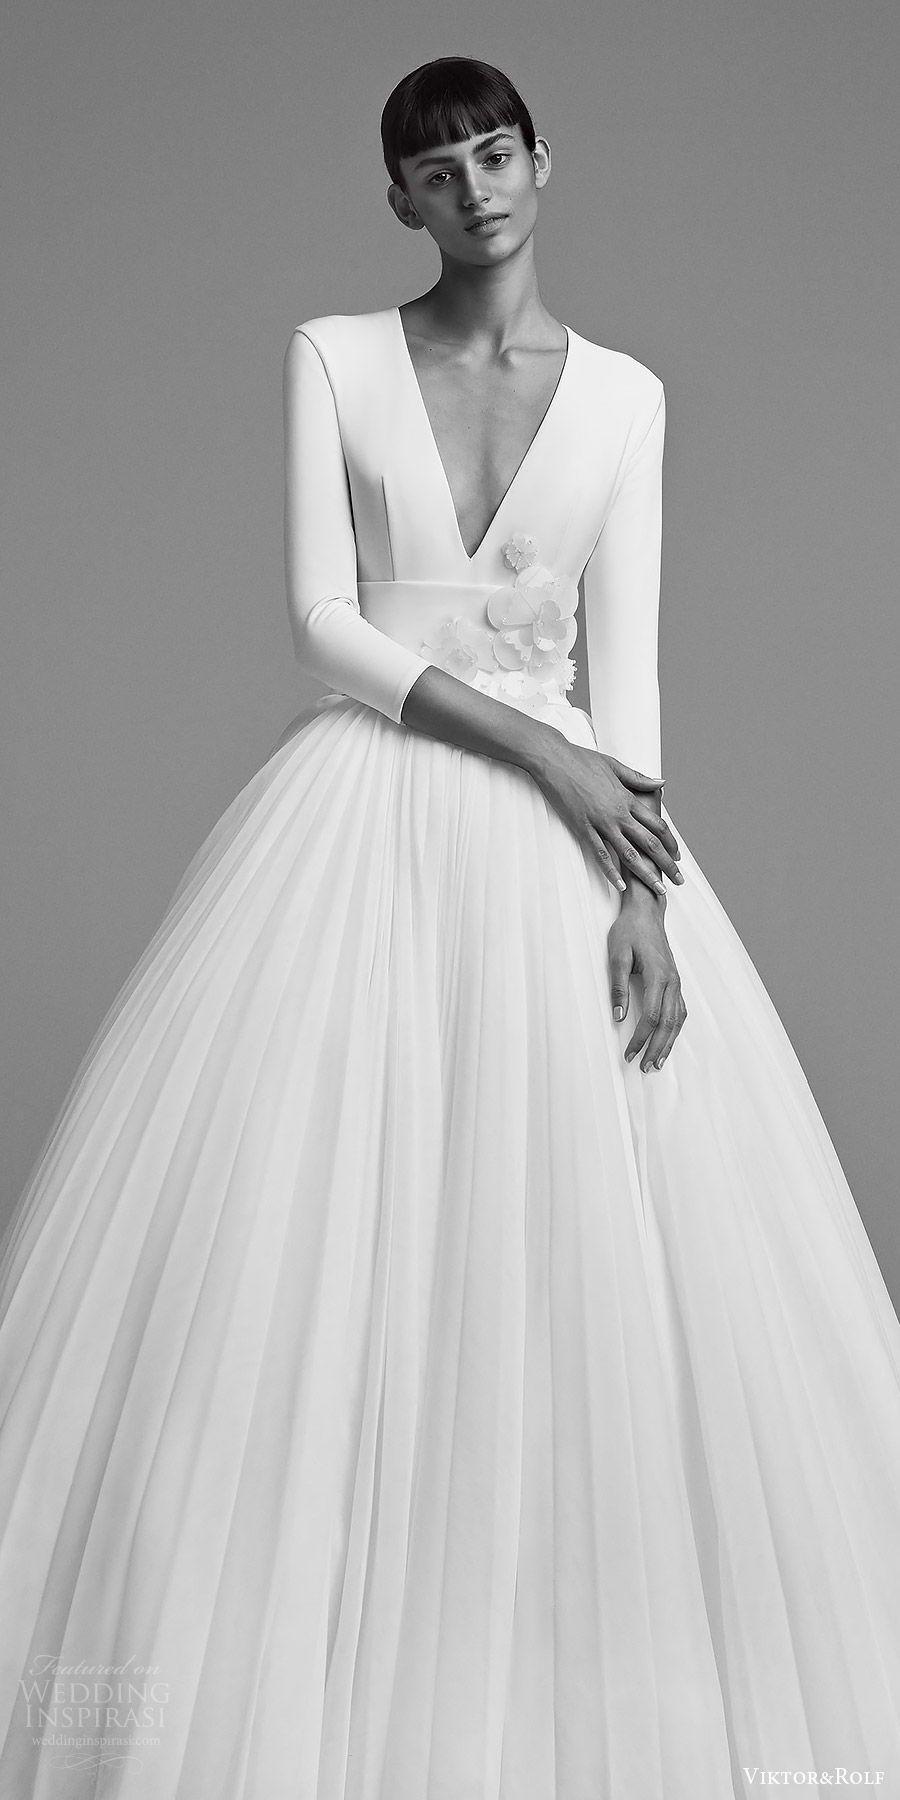 Viktorurolf fall wedding dresses ball gowns minimal and romantic